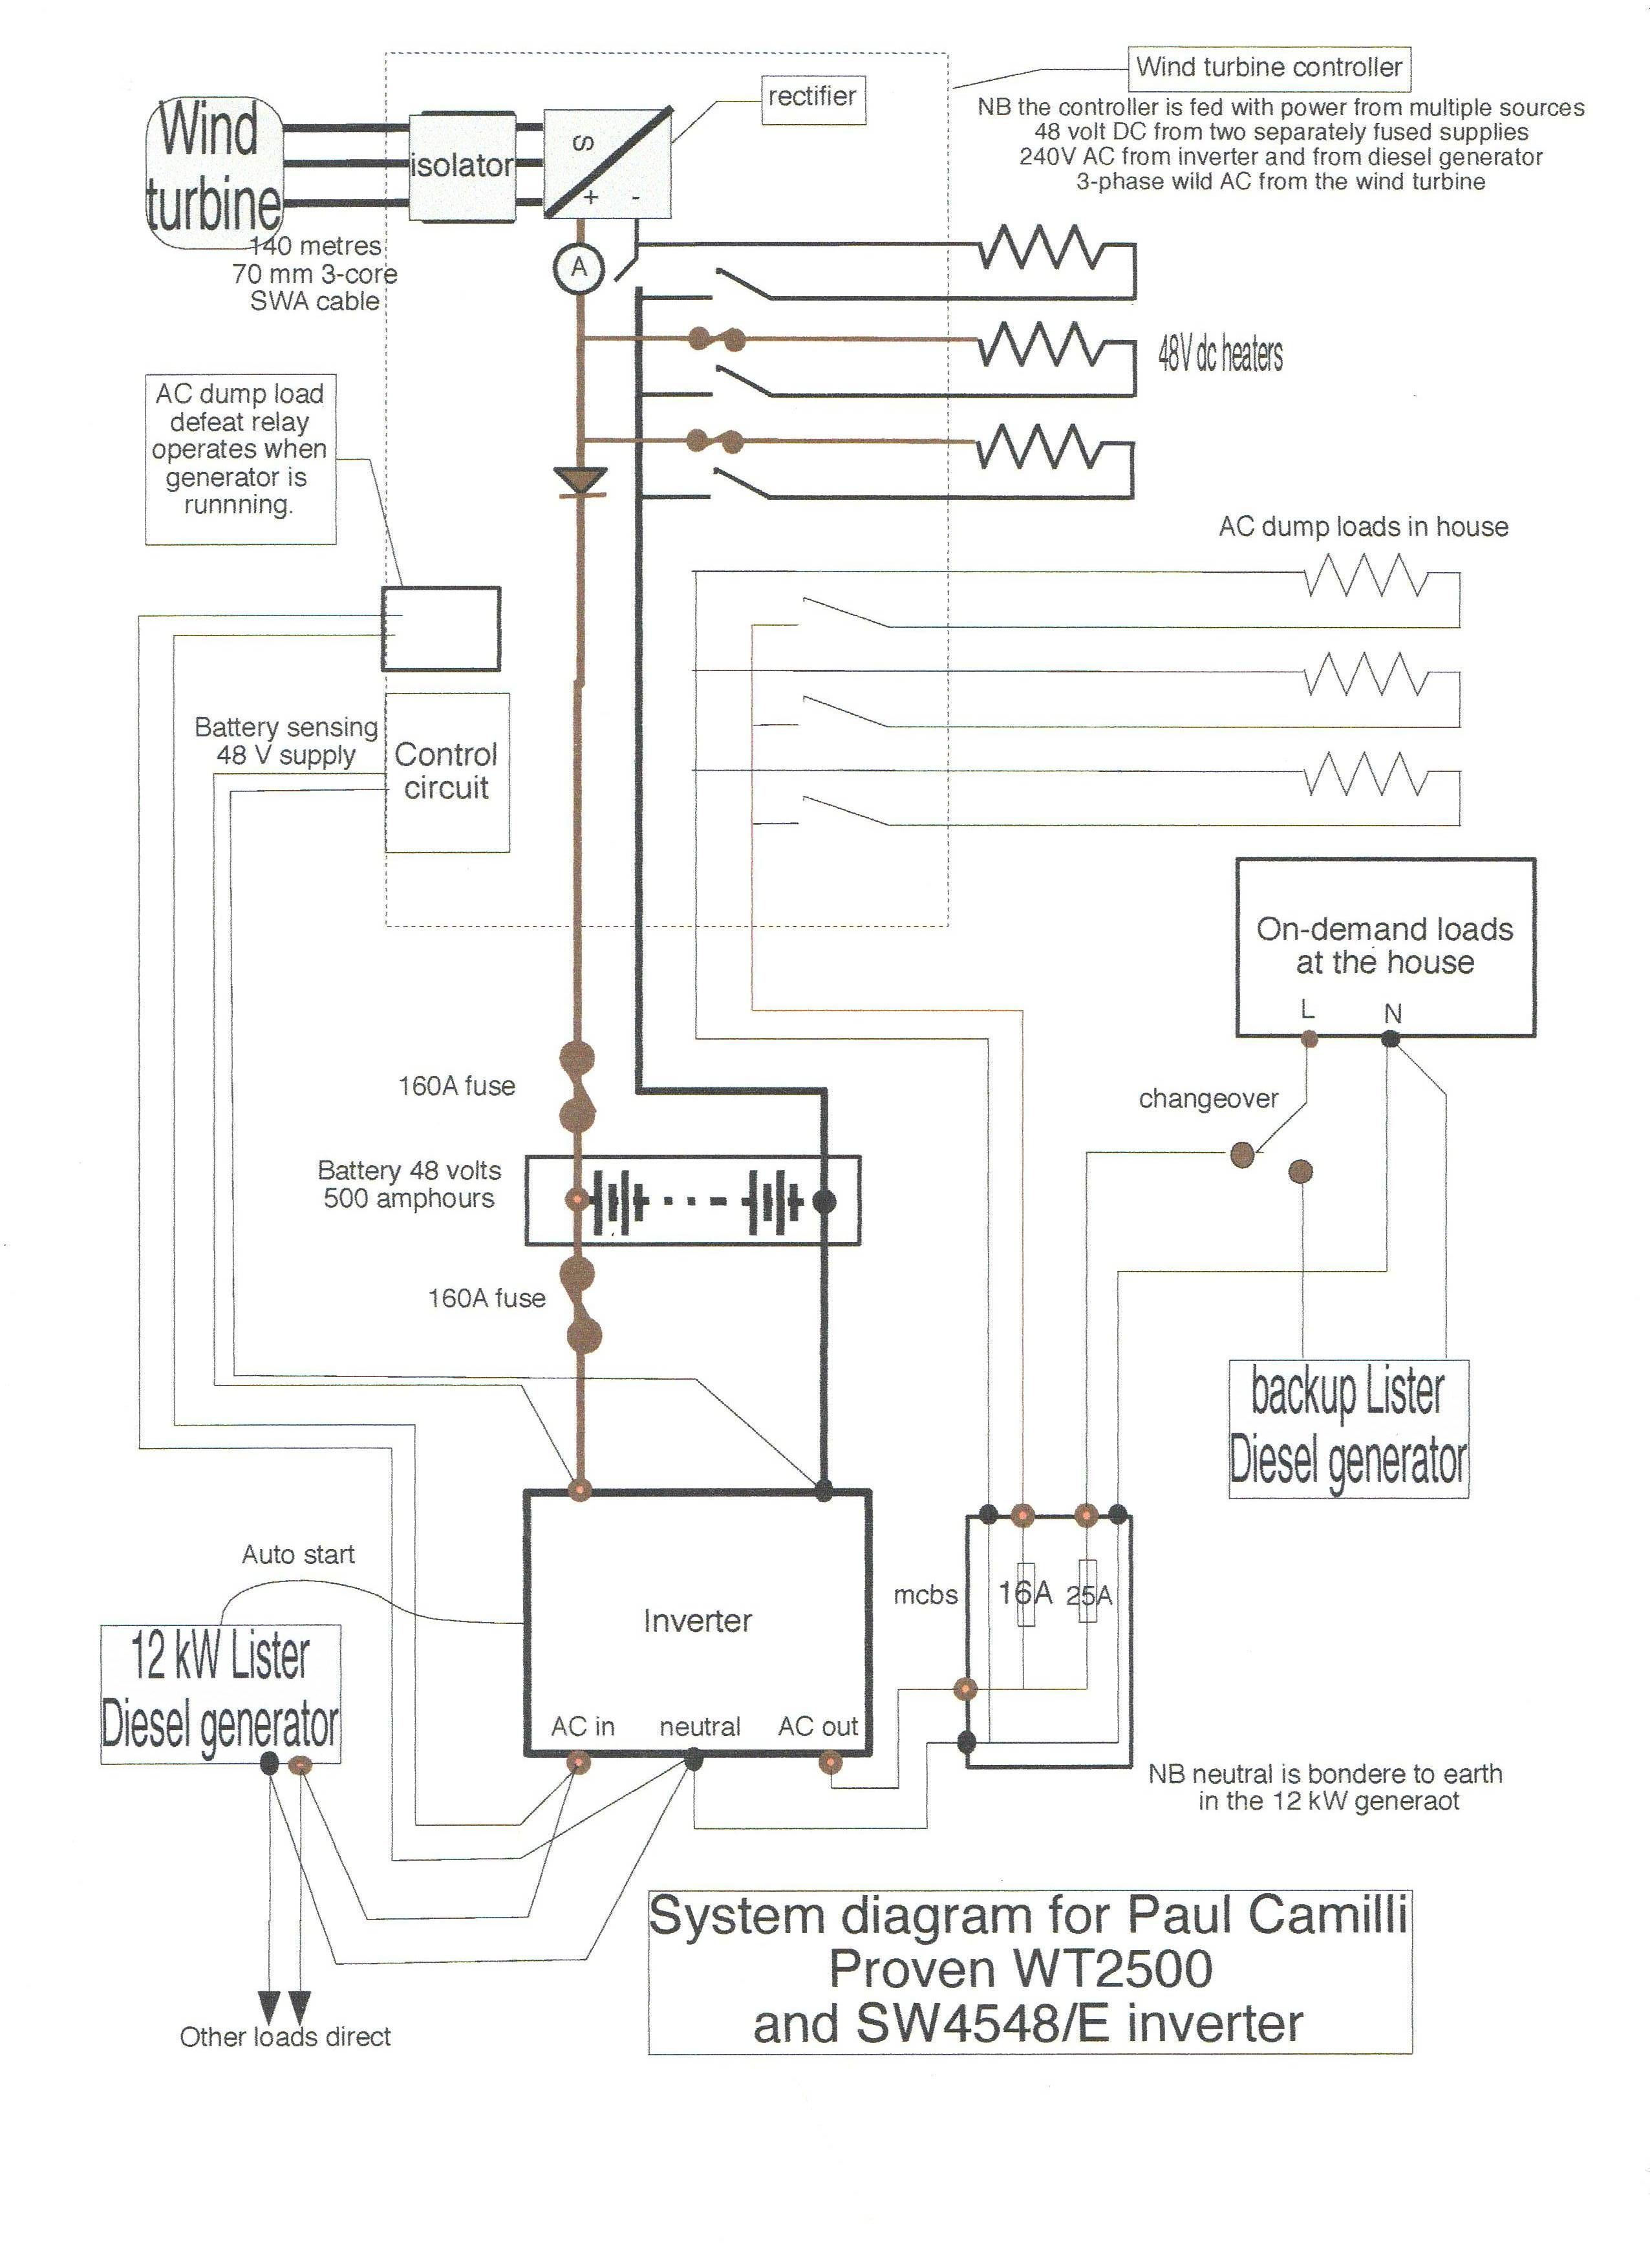 Wind turbine wiring diagram | Homesteading | Wind turbine